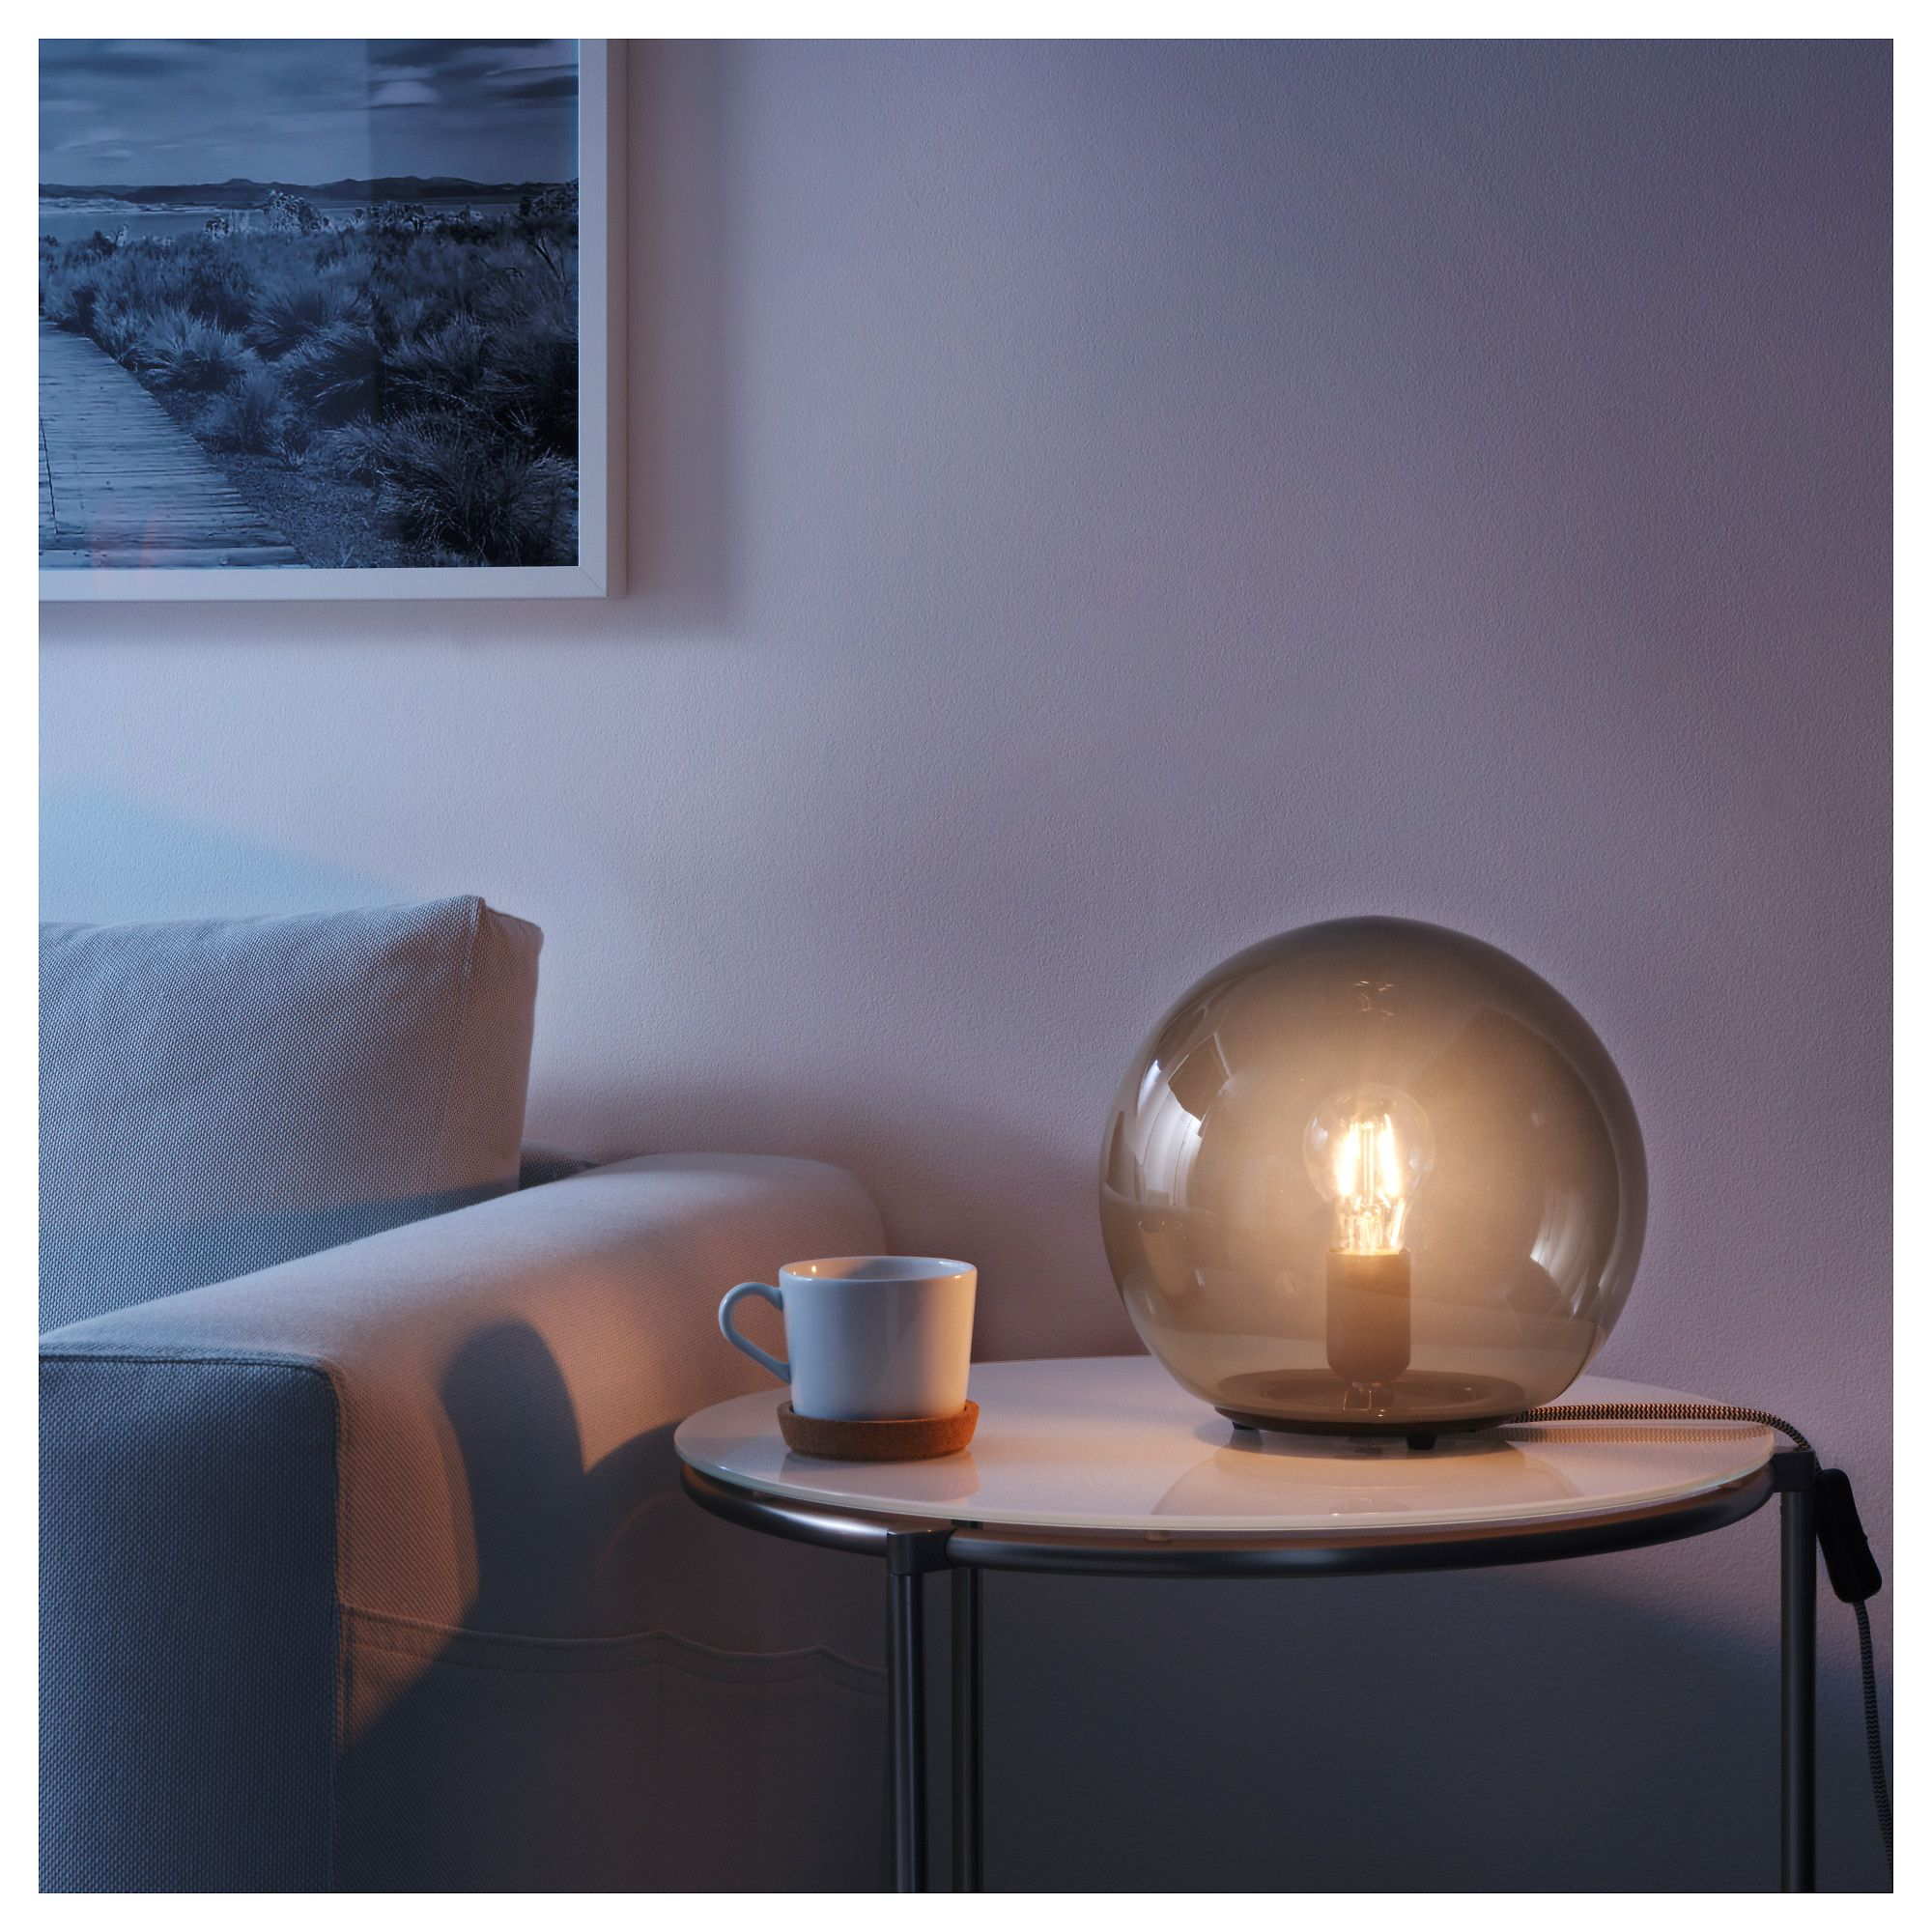 Fado table lamp grey ikea lamp gray and cosy fado table lamp grey geotapseo Choice Image